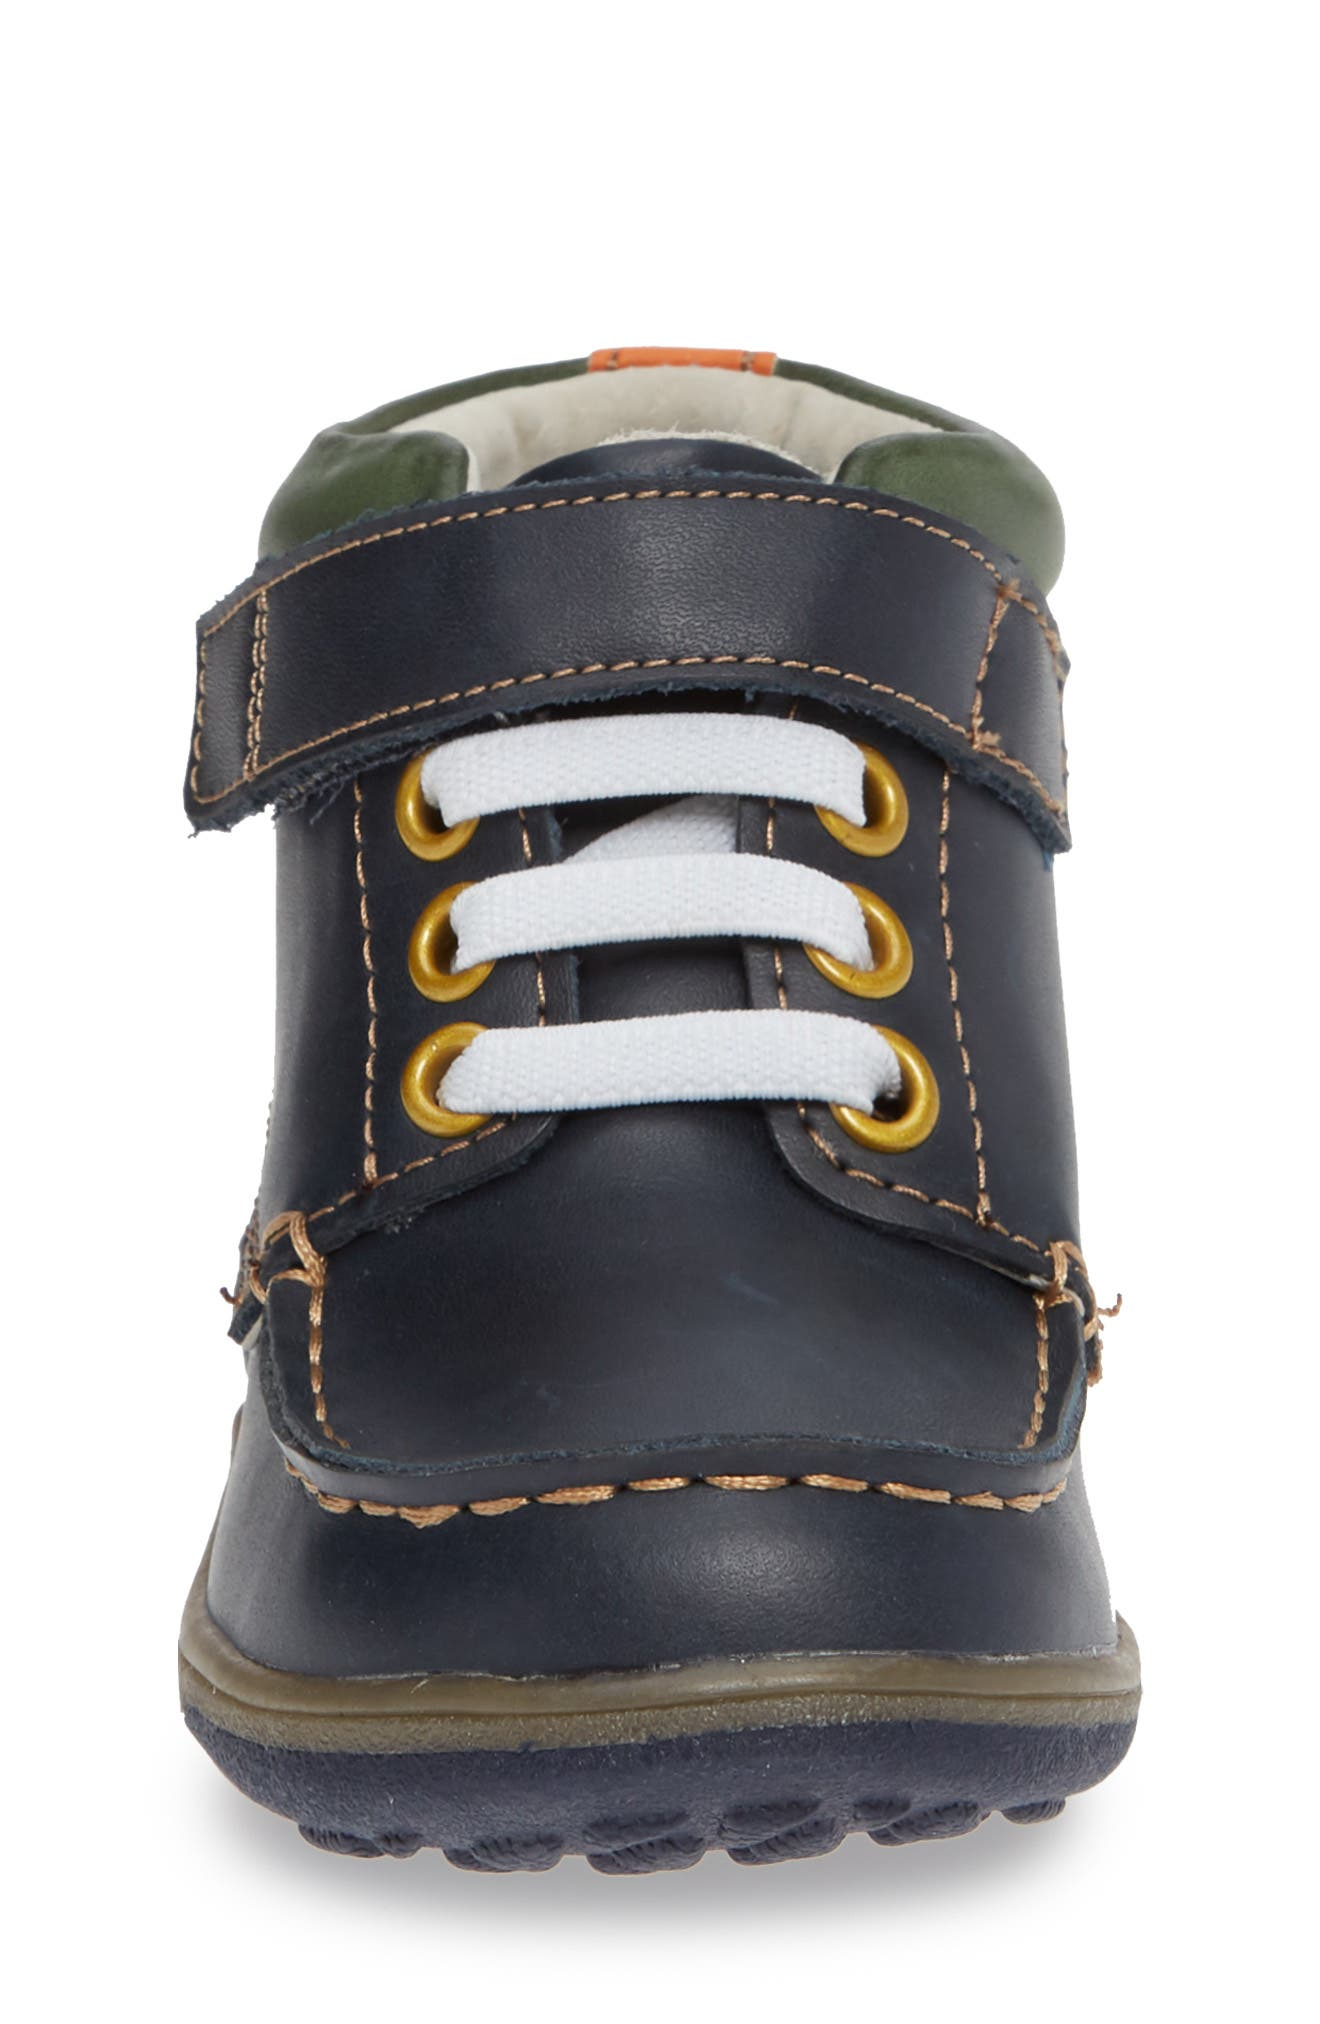 Owen High Top Sneaker Bootie,                             Alternate thumbnail 4, color,                             NAVY